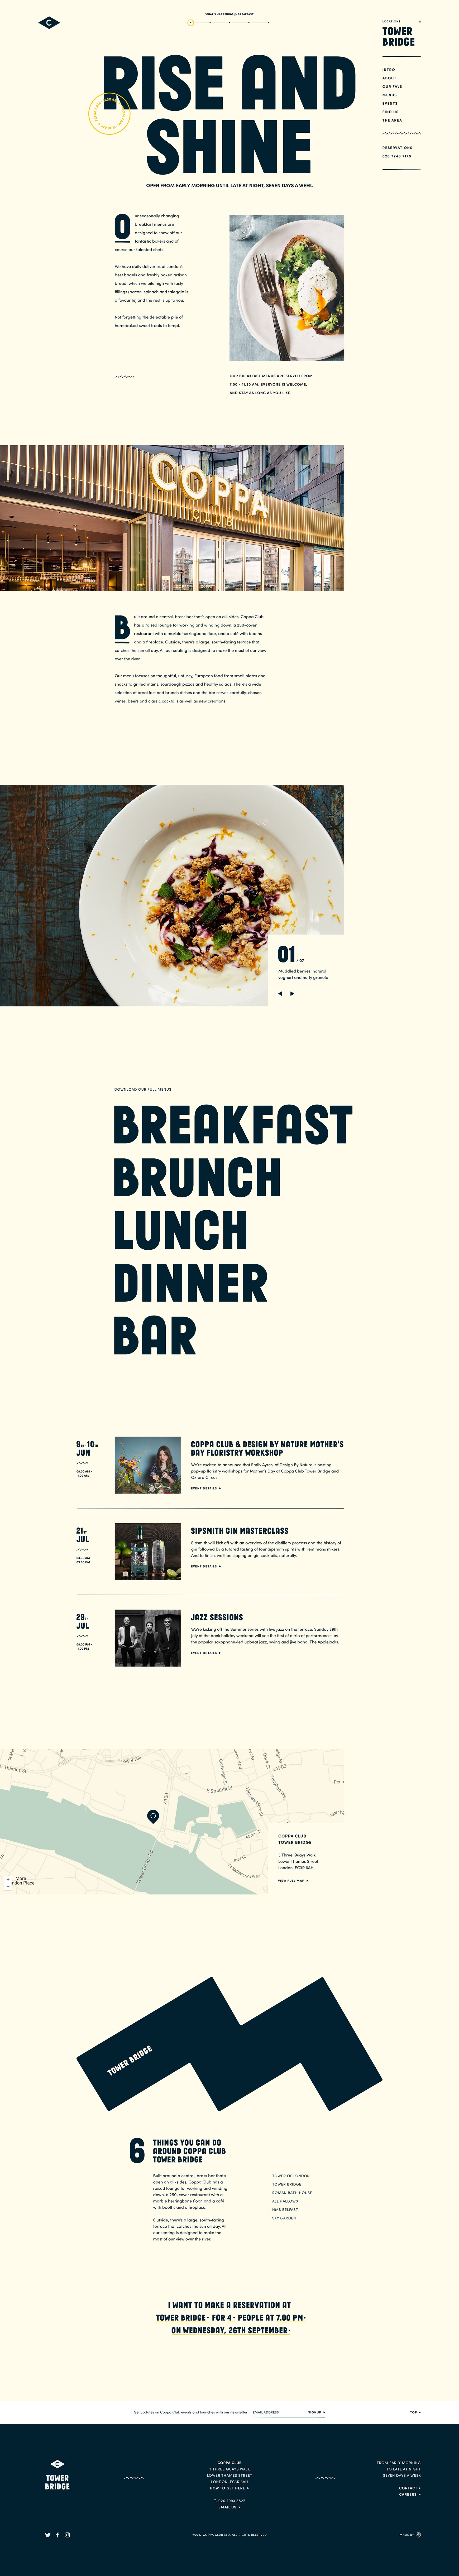 01 cc location breakfast